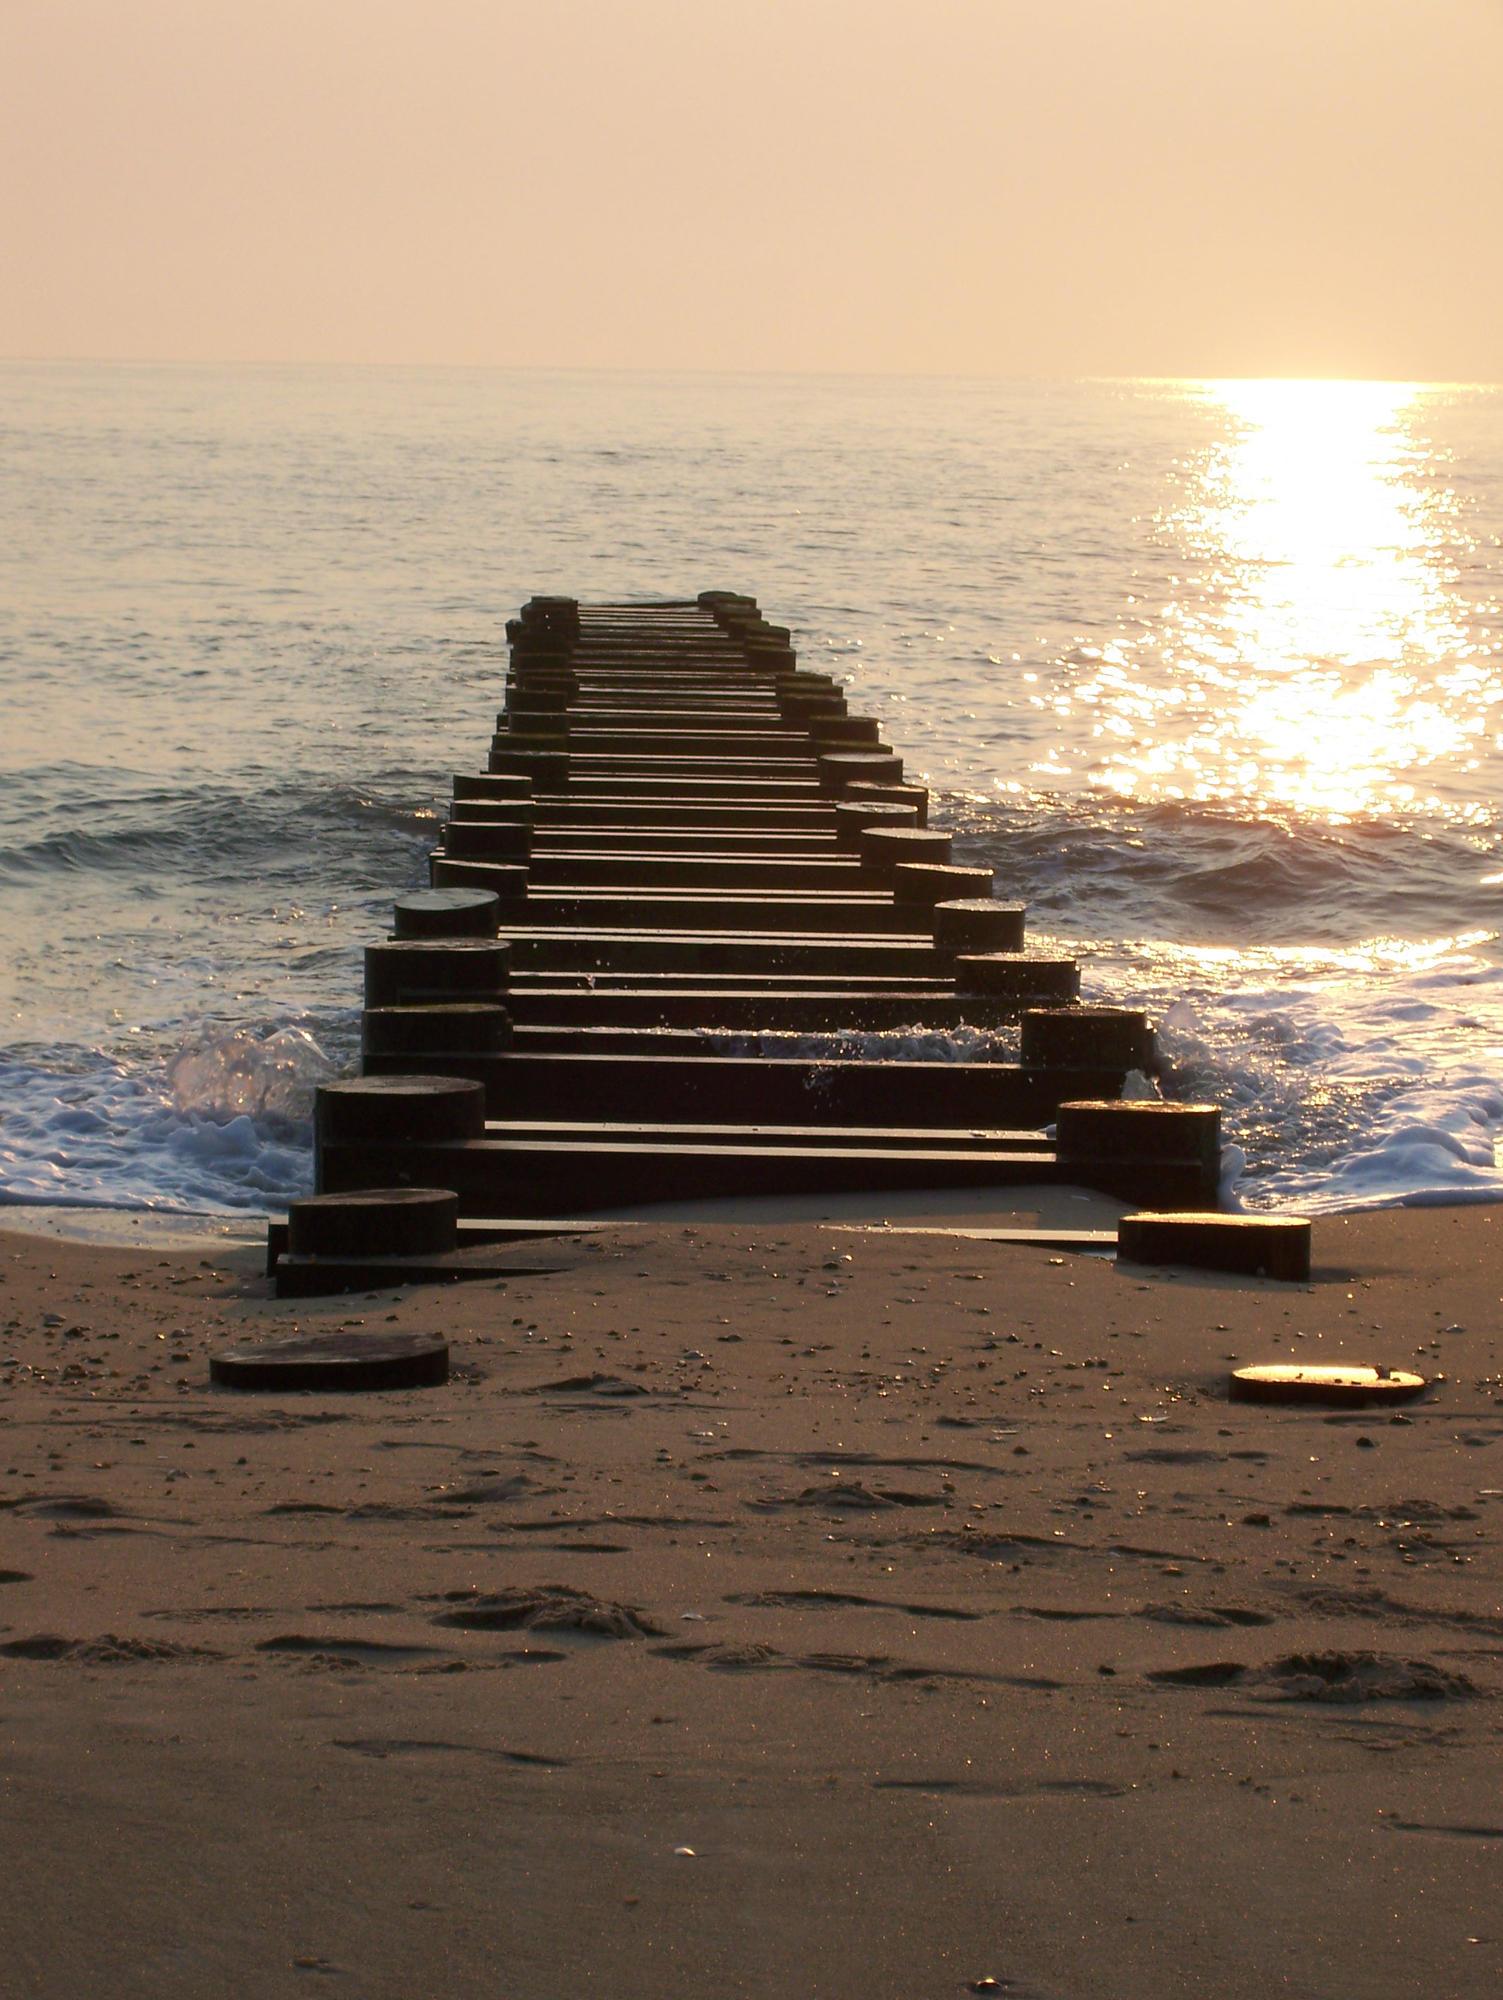 Beach Stock9 by Cinnamoncandy-Stock